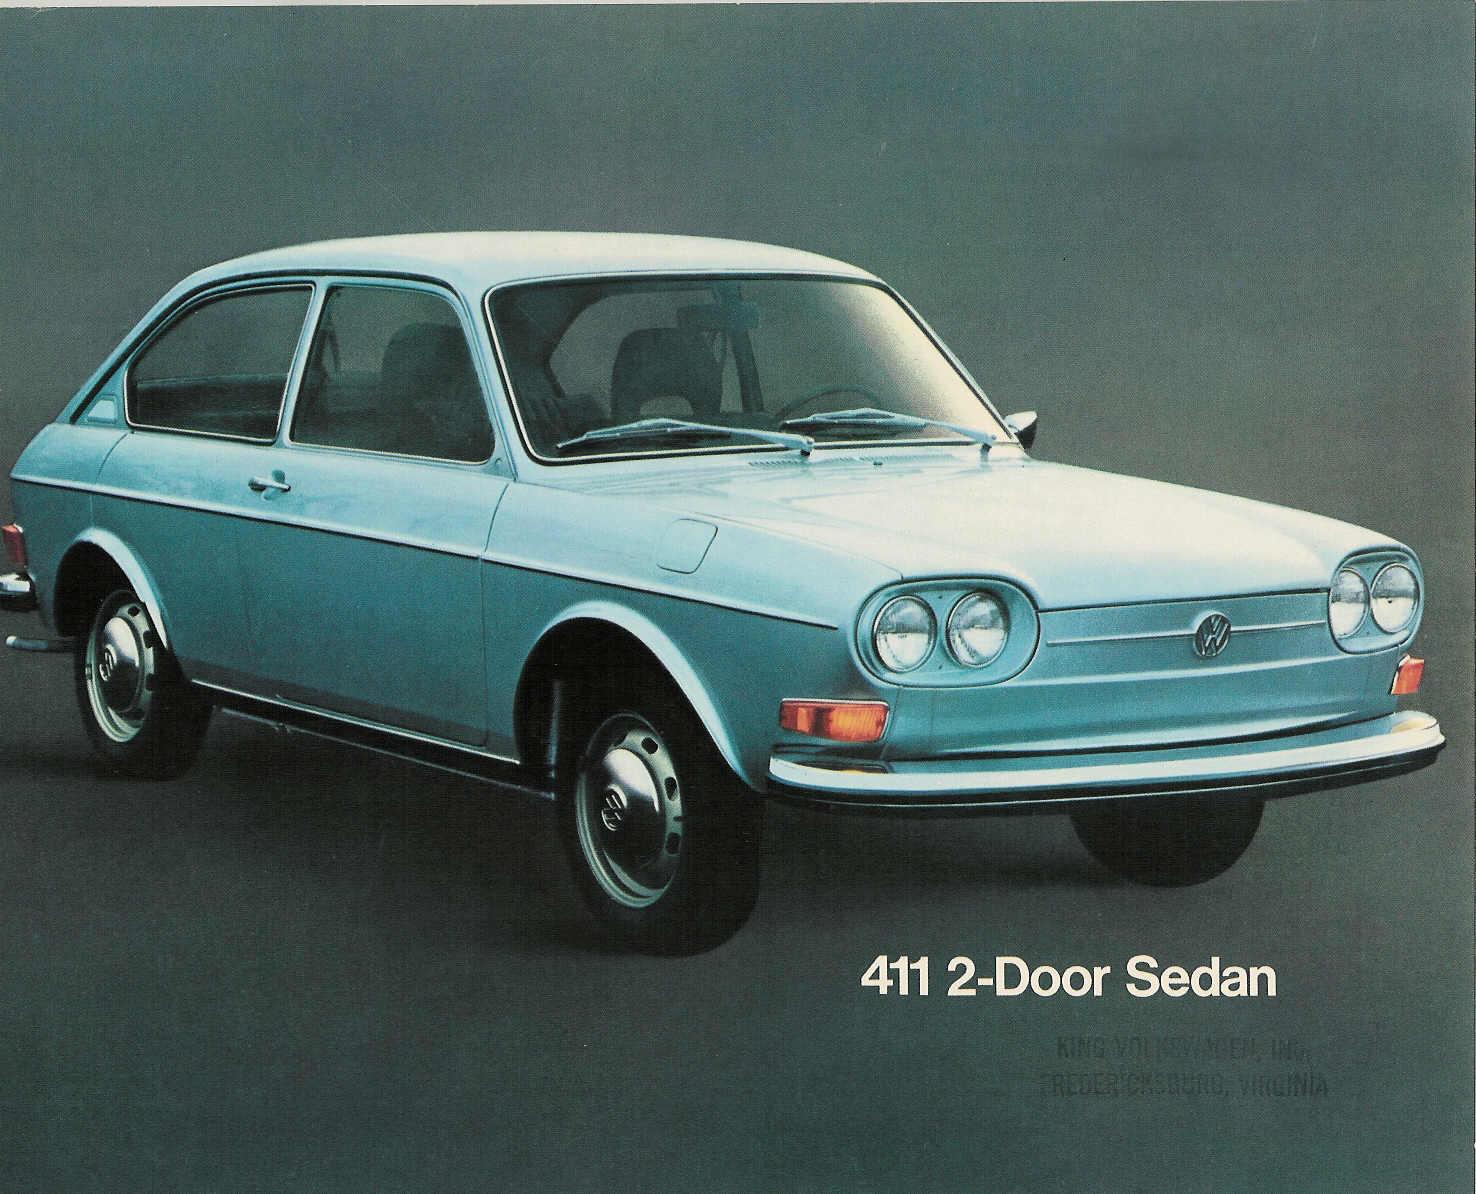 TheSamba.com :: VW Archives - 1972 US Color sheet - VW 411 2-door ...